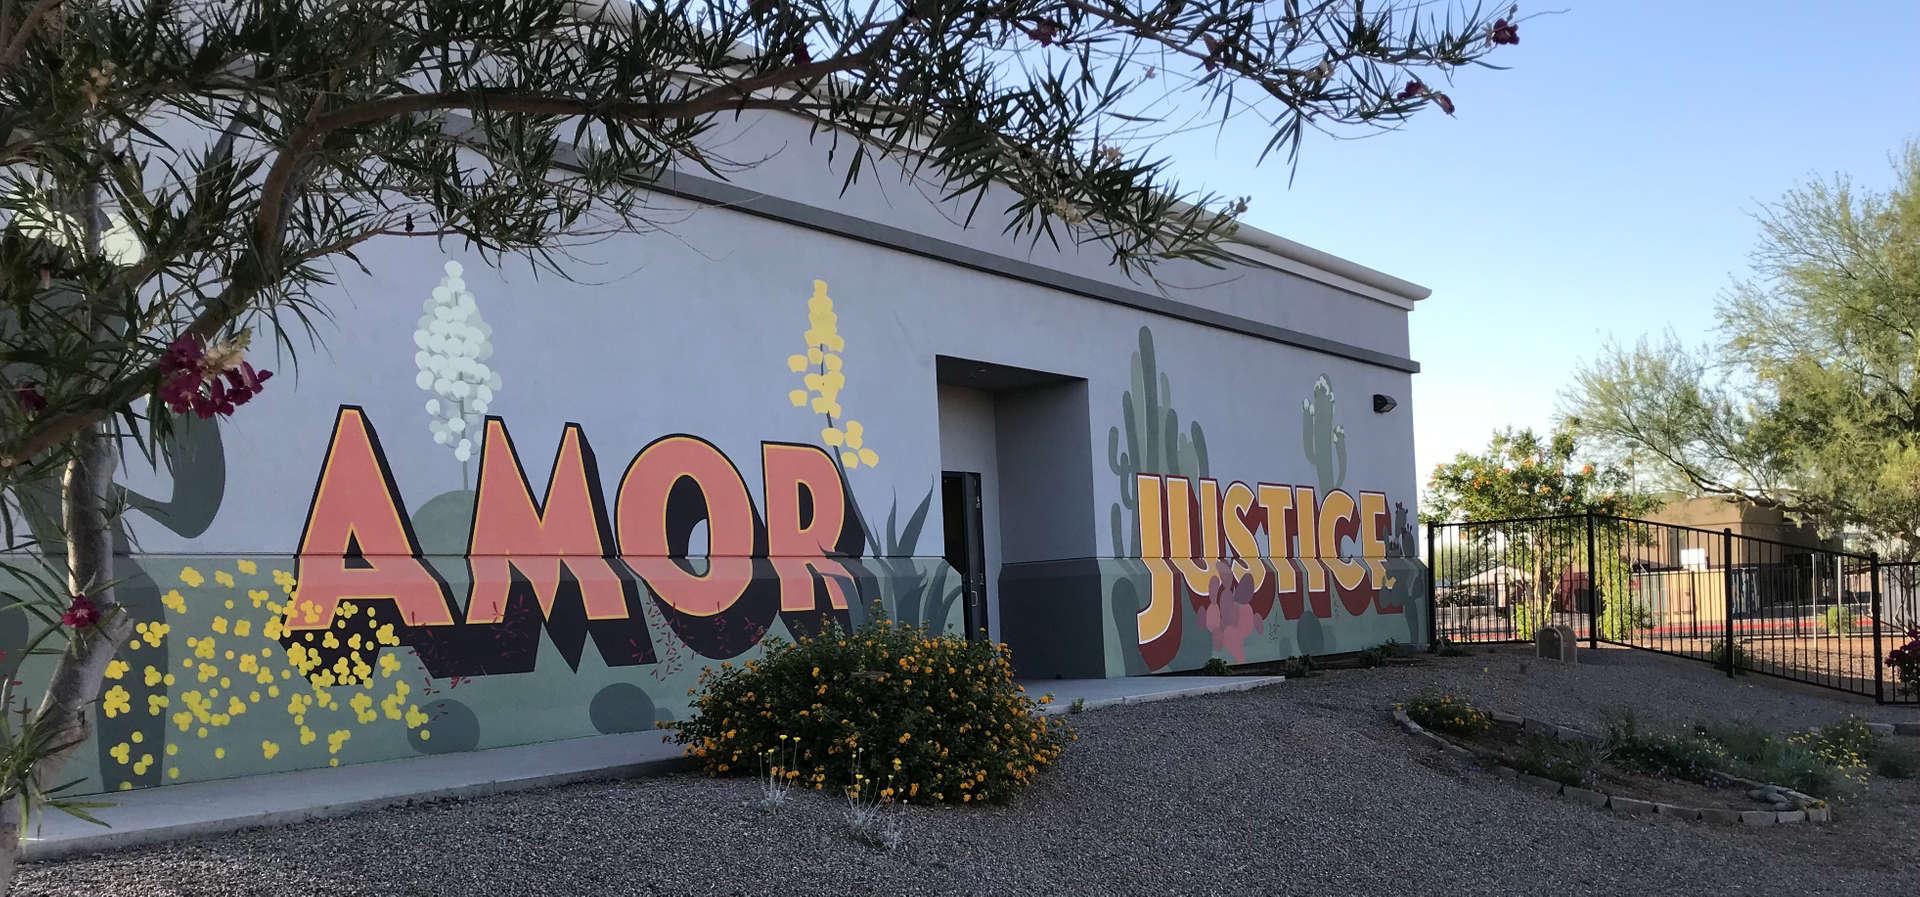 Amor Justice mural